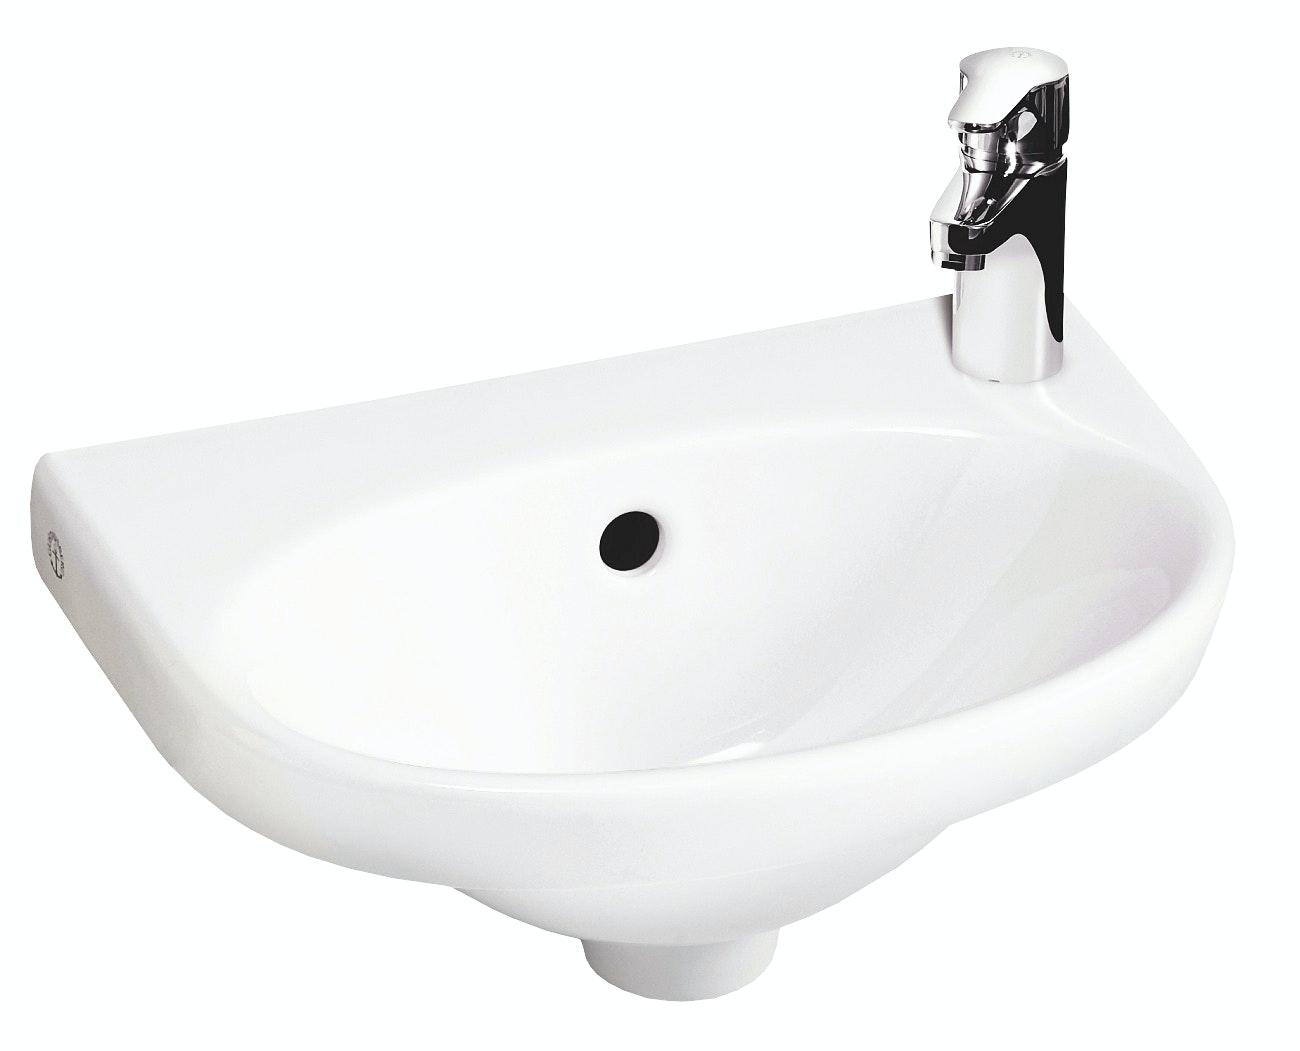 Tvättställ Gustavsberg 5540 C+ Nautic Vit Vänster